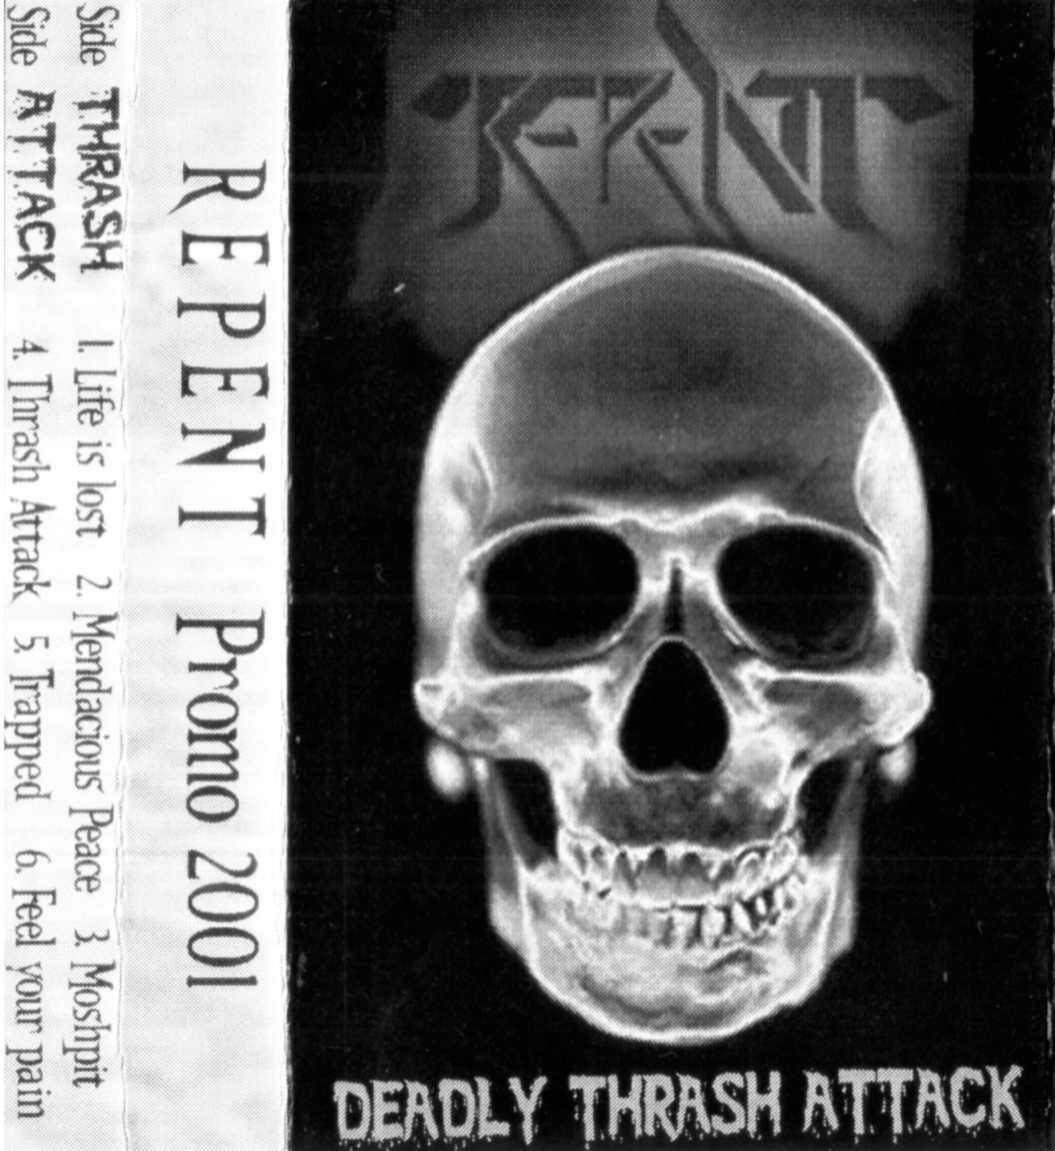 deadly-thrash-attack-demo-cover.jpg